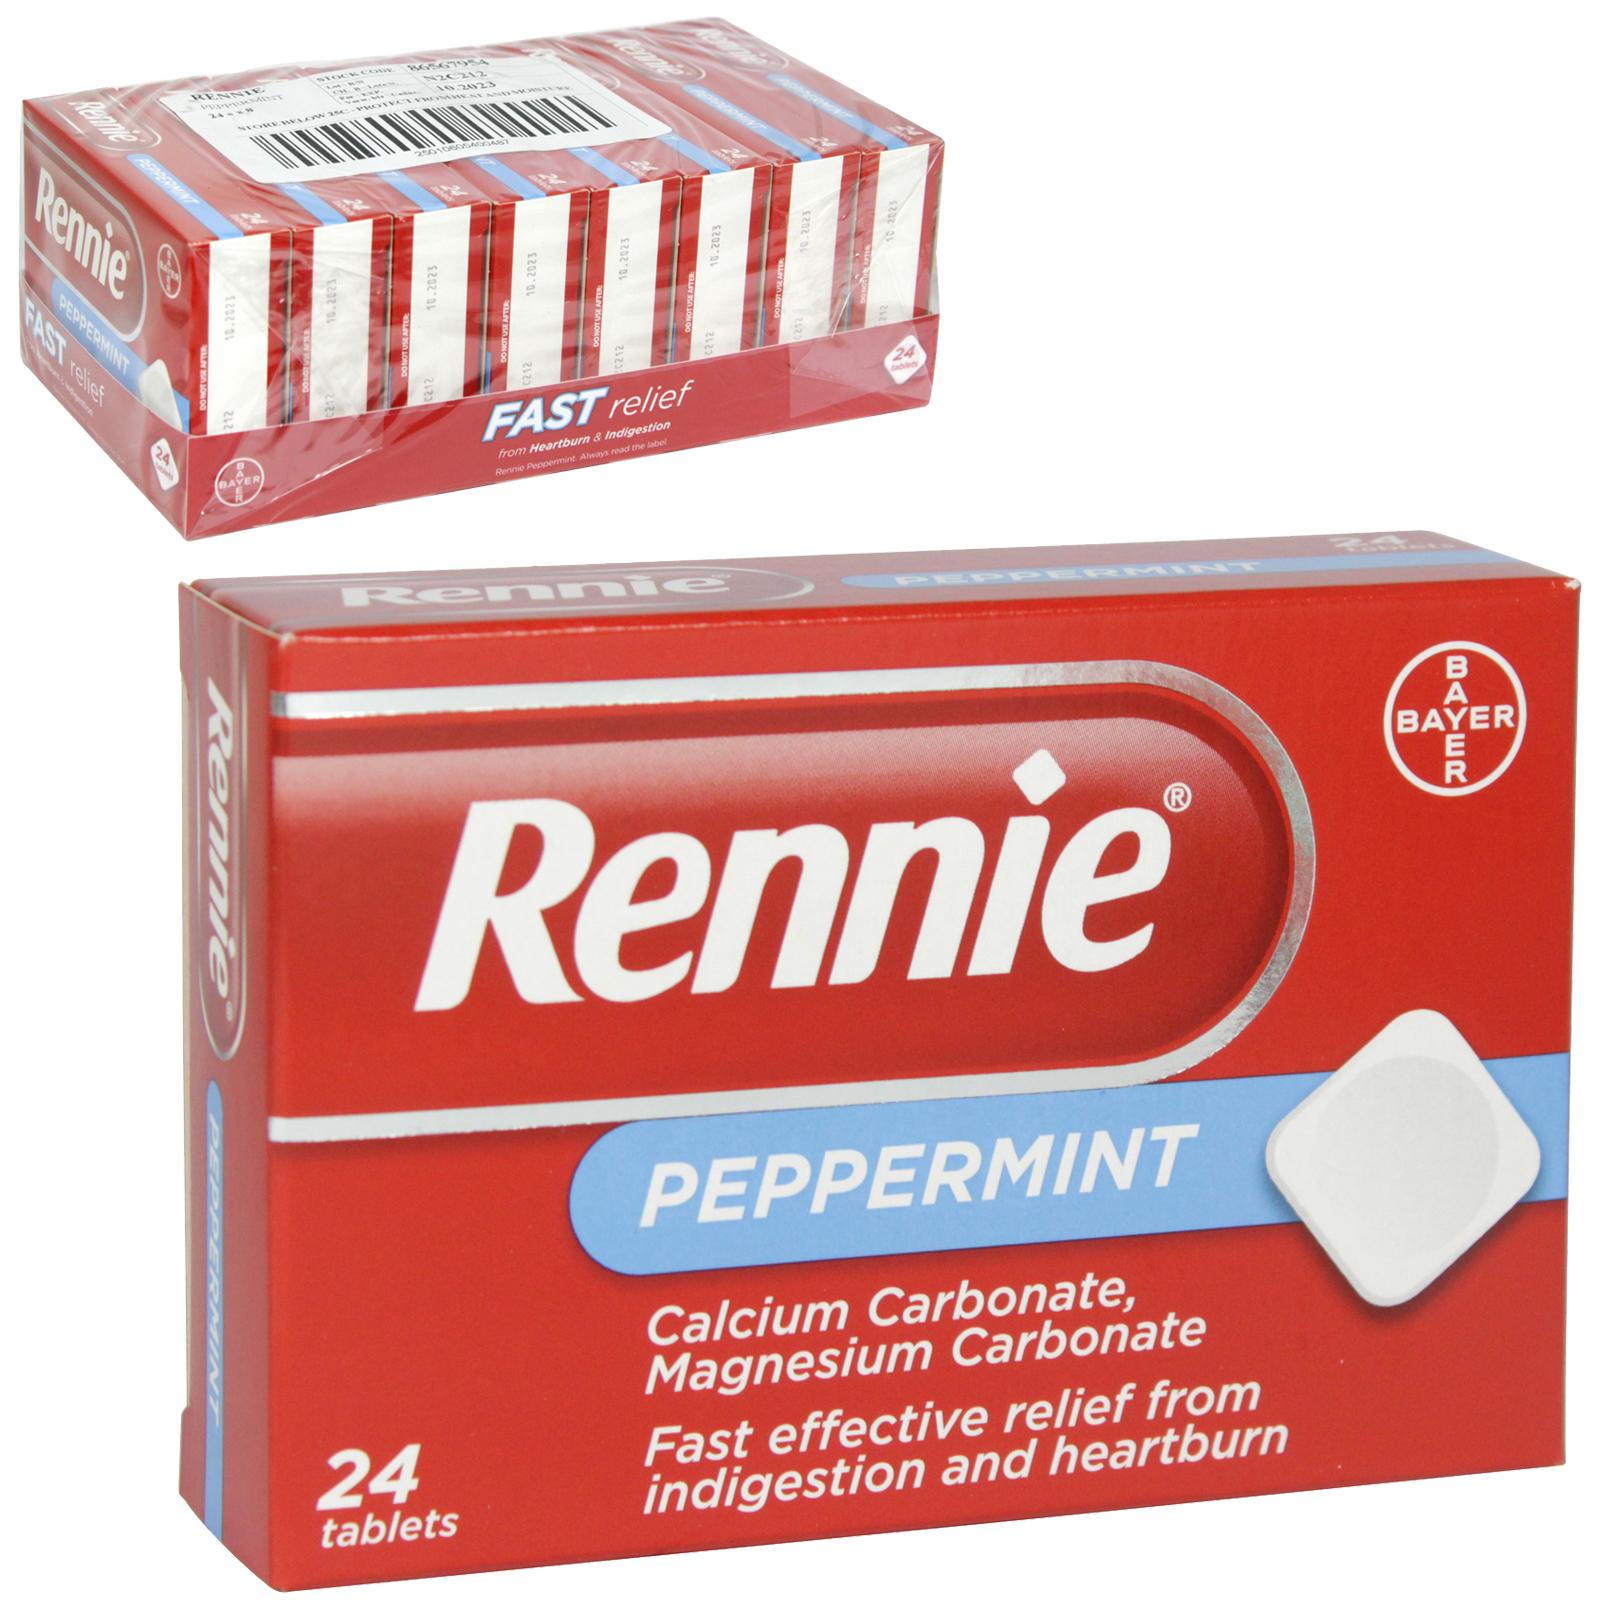 RENNIE DIGESTIF 24S PEPPERMINT X12 (NON RETURNABLE)